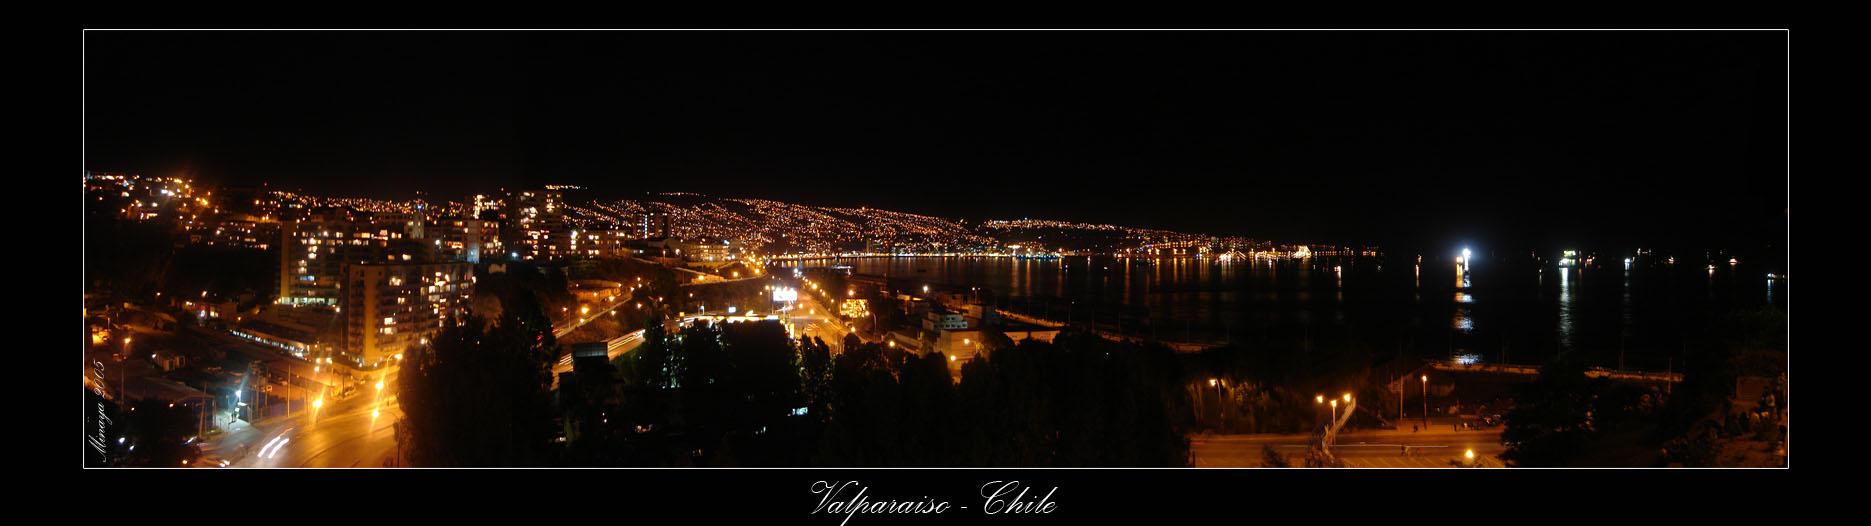 Valparaiso_Chile__by_Minaya.jpg